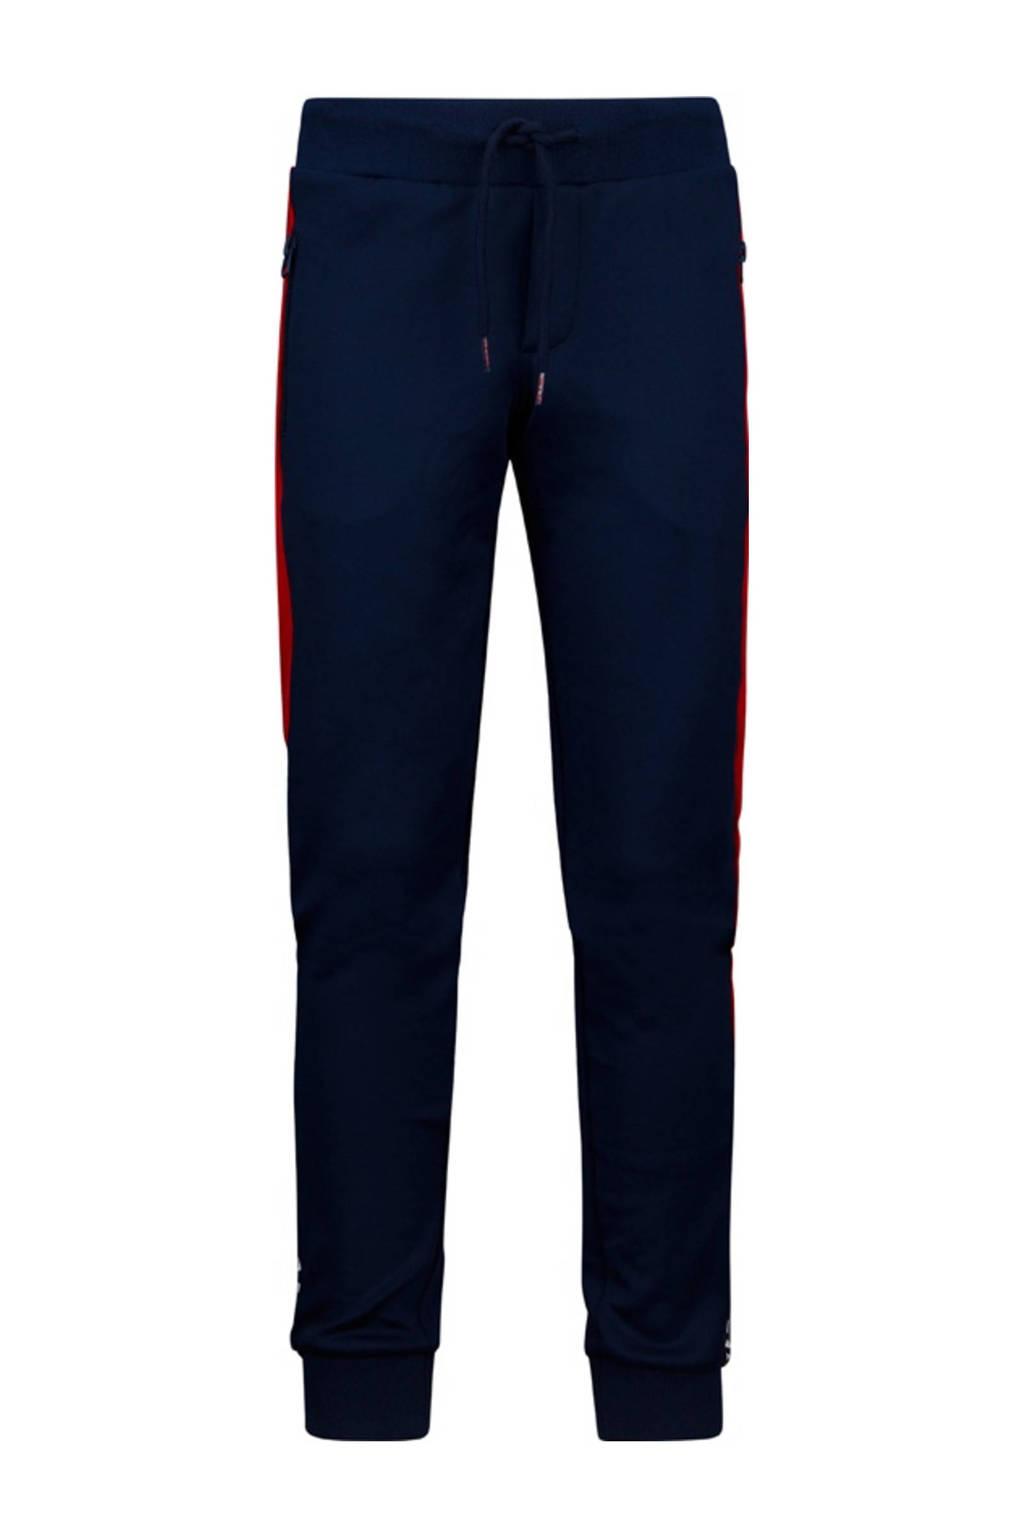 Retour Denim slim fit joggingbroek Henri donkerblauw/rood/wit, Donkerblauw/rood/wit